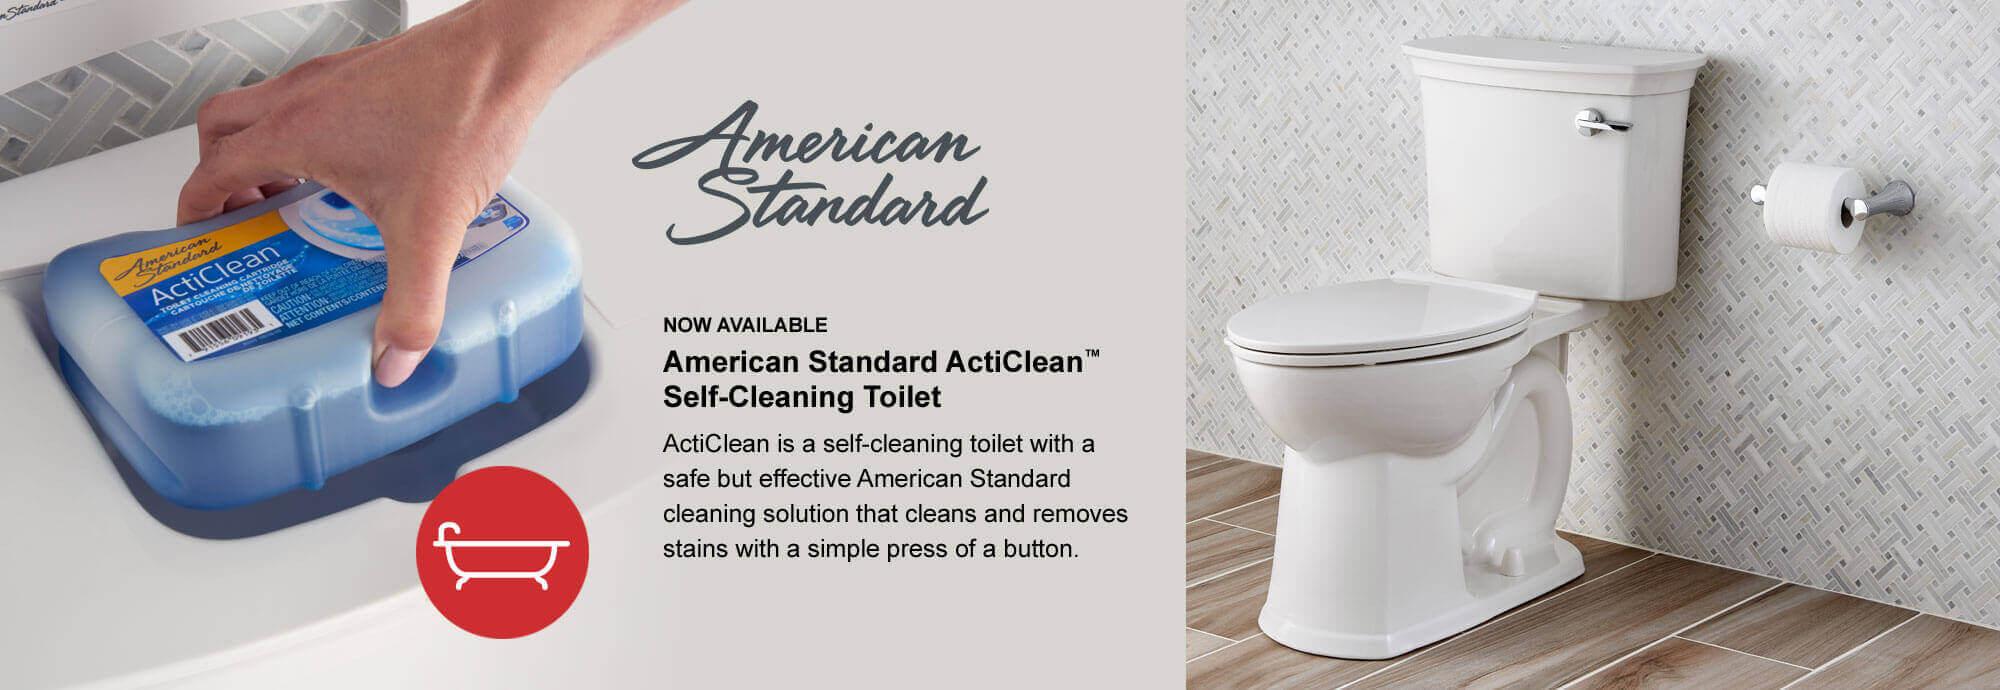 Kitchen & Bath Classics   Plumbing Fixtures, Faucets, Accessories